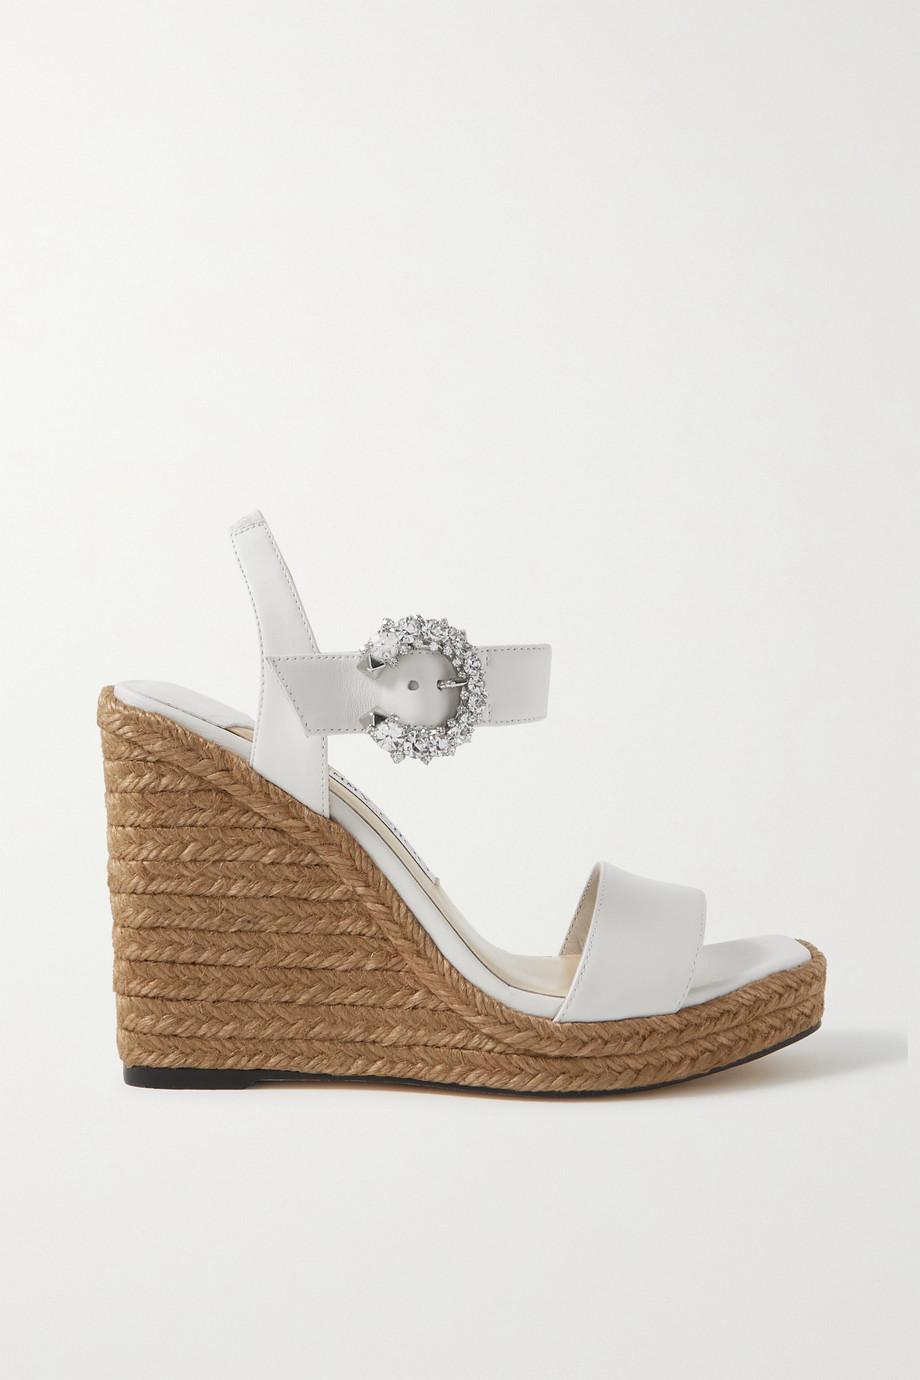 Jimmy Choo Mirabelle 110 crystal-embellished leather espadrille wedge sandals